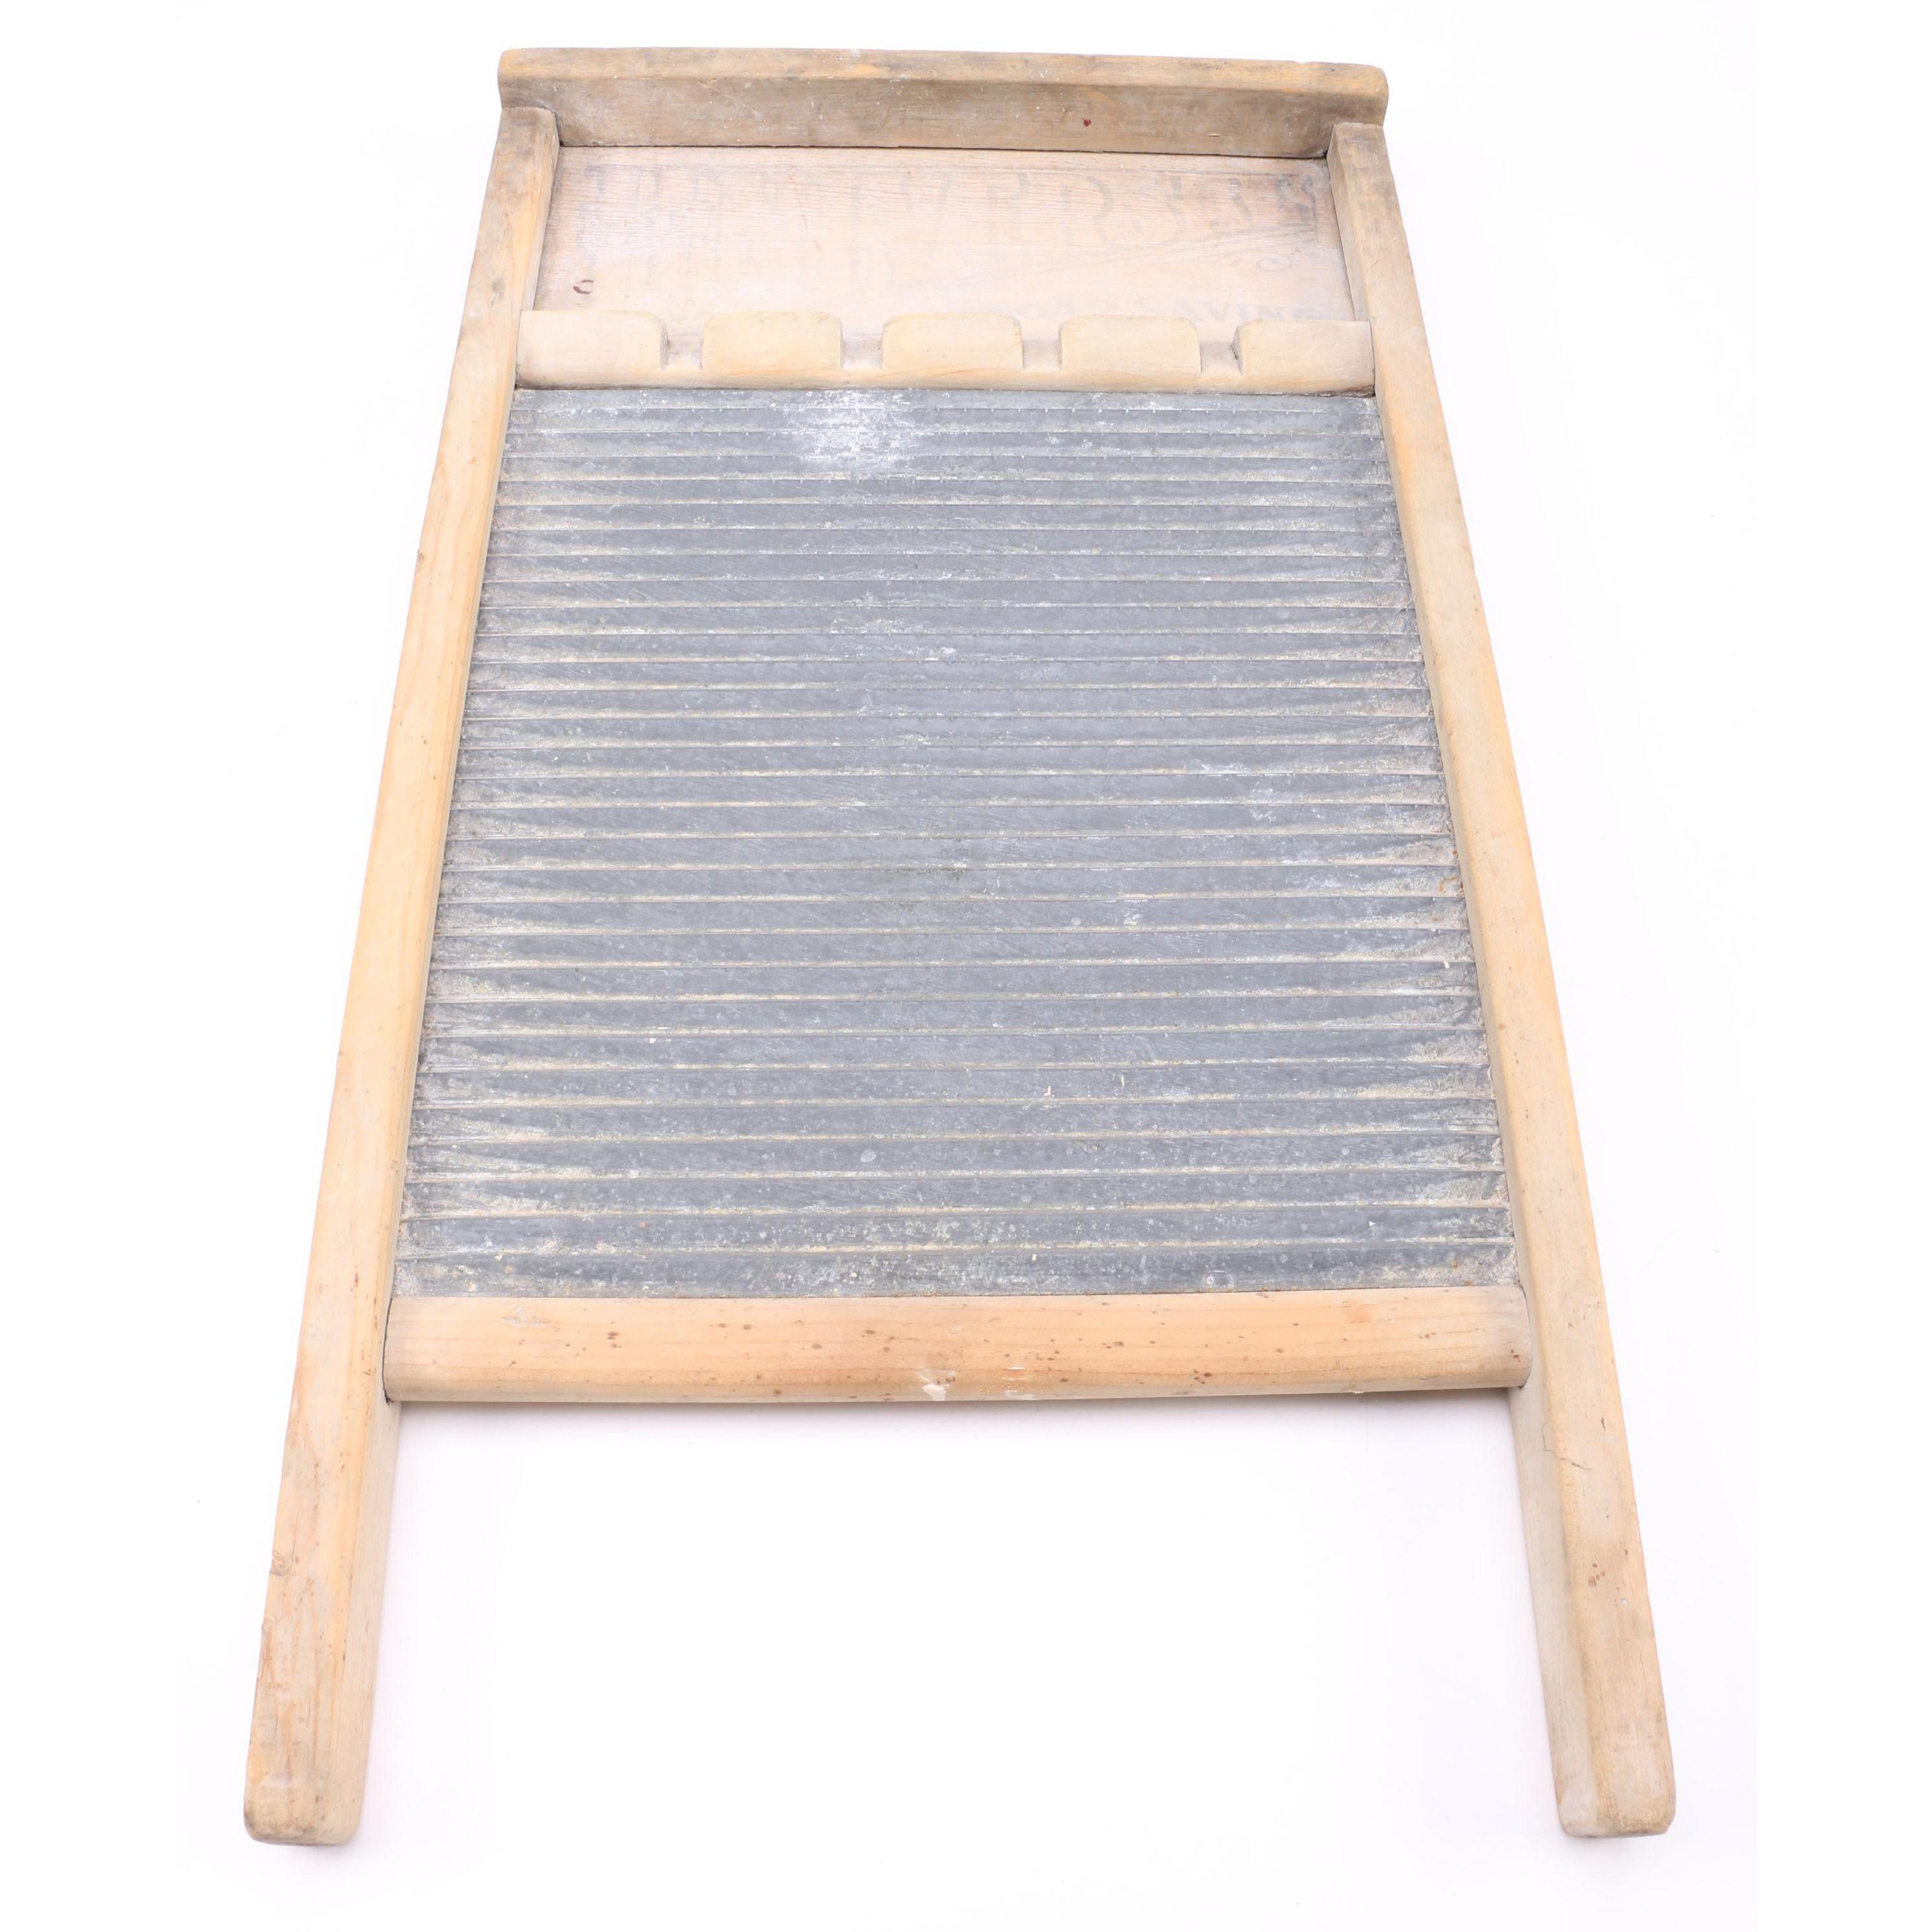 National Washboard Co. No. 134 Washboard